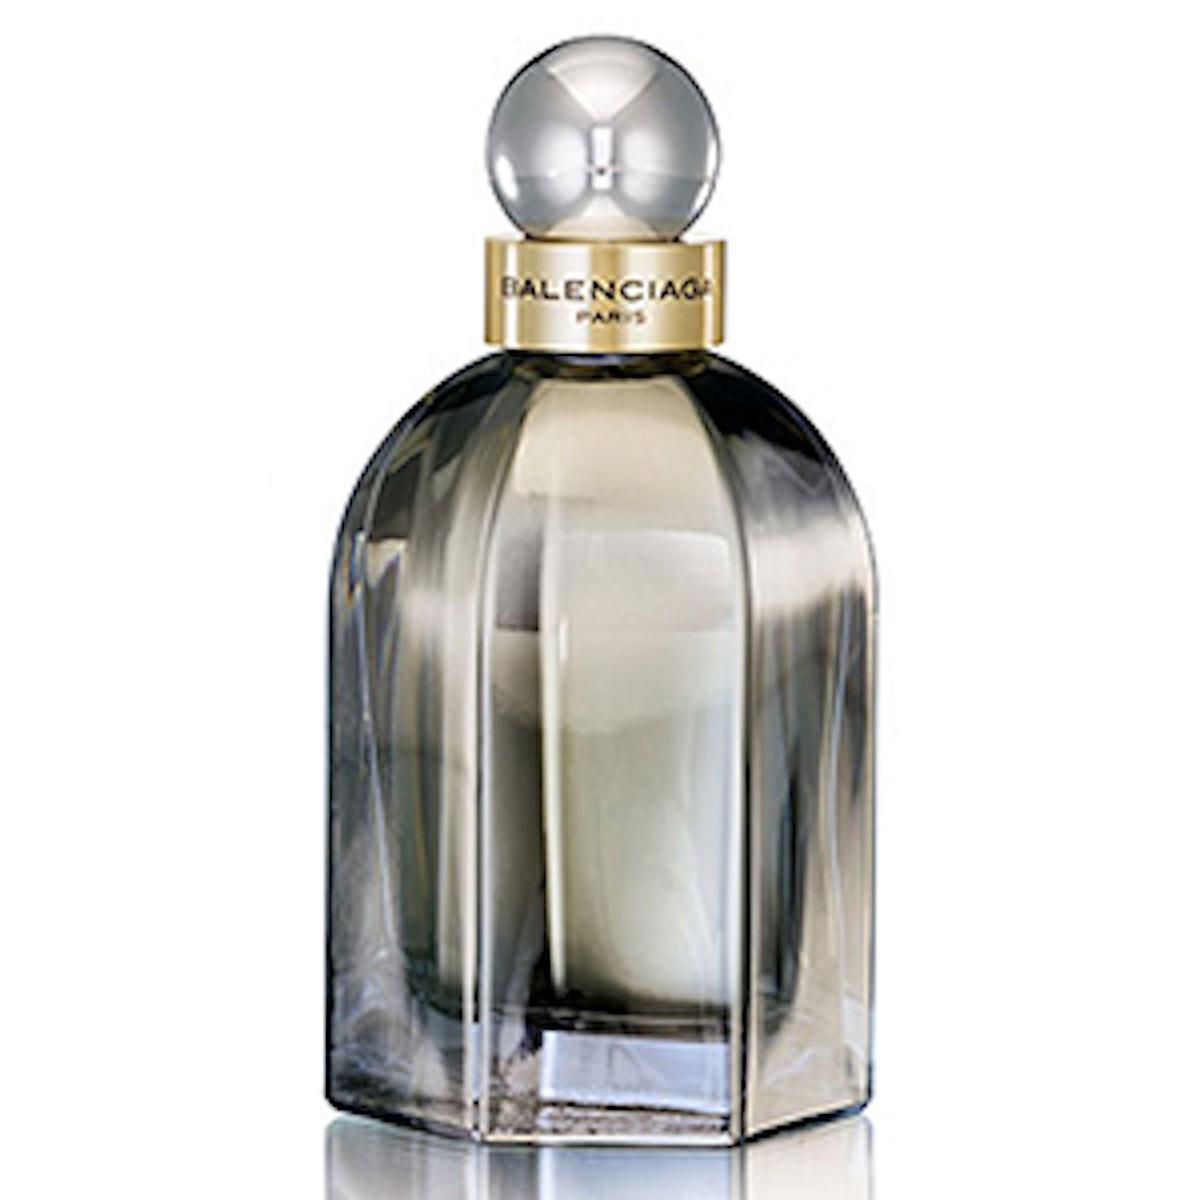 Limited Edition Balenciaga Paris Eau de Parfum